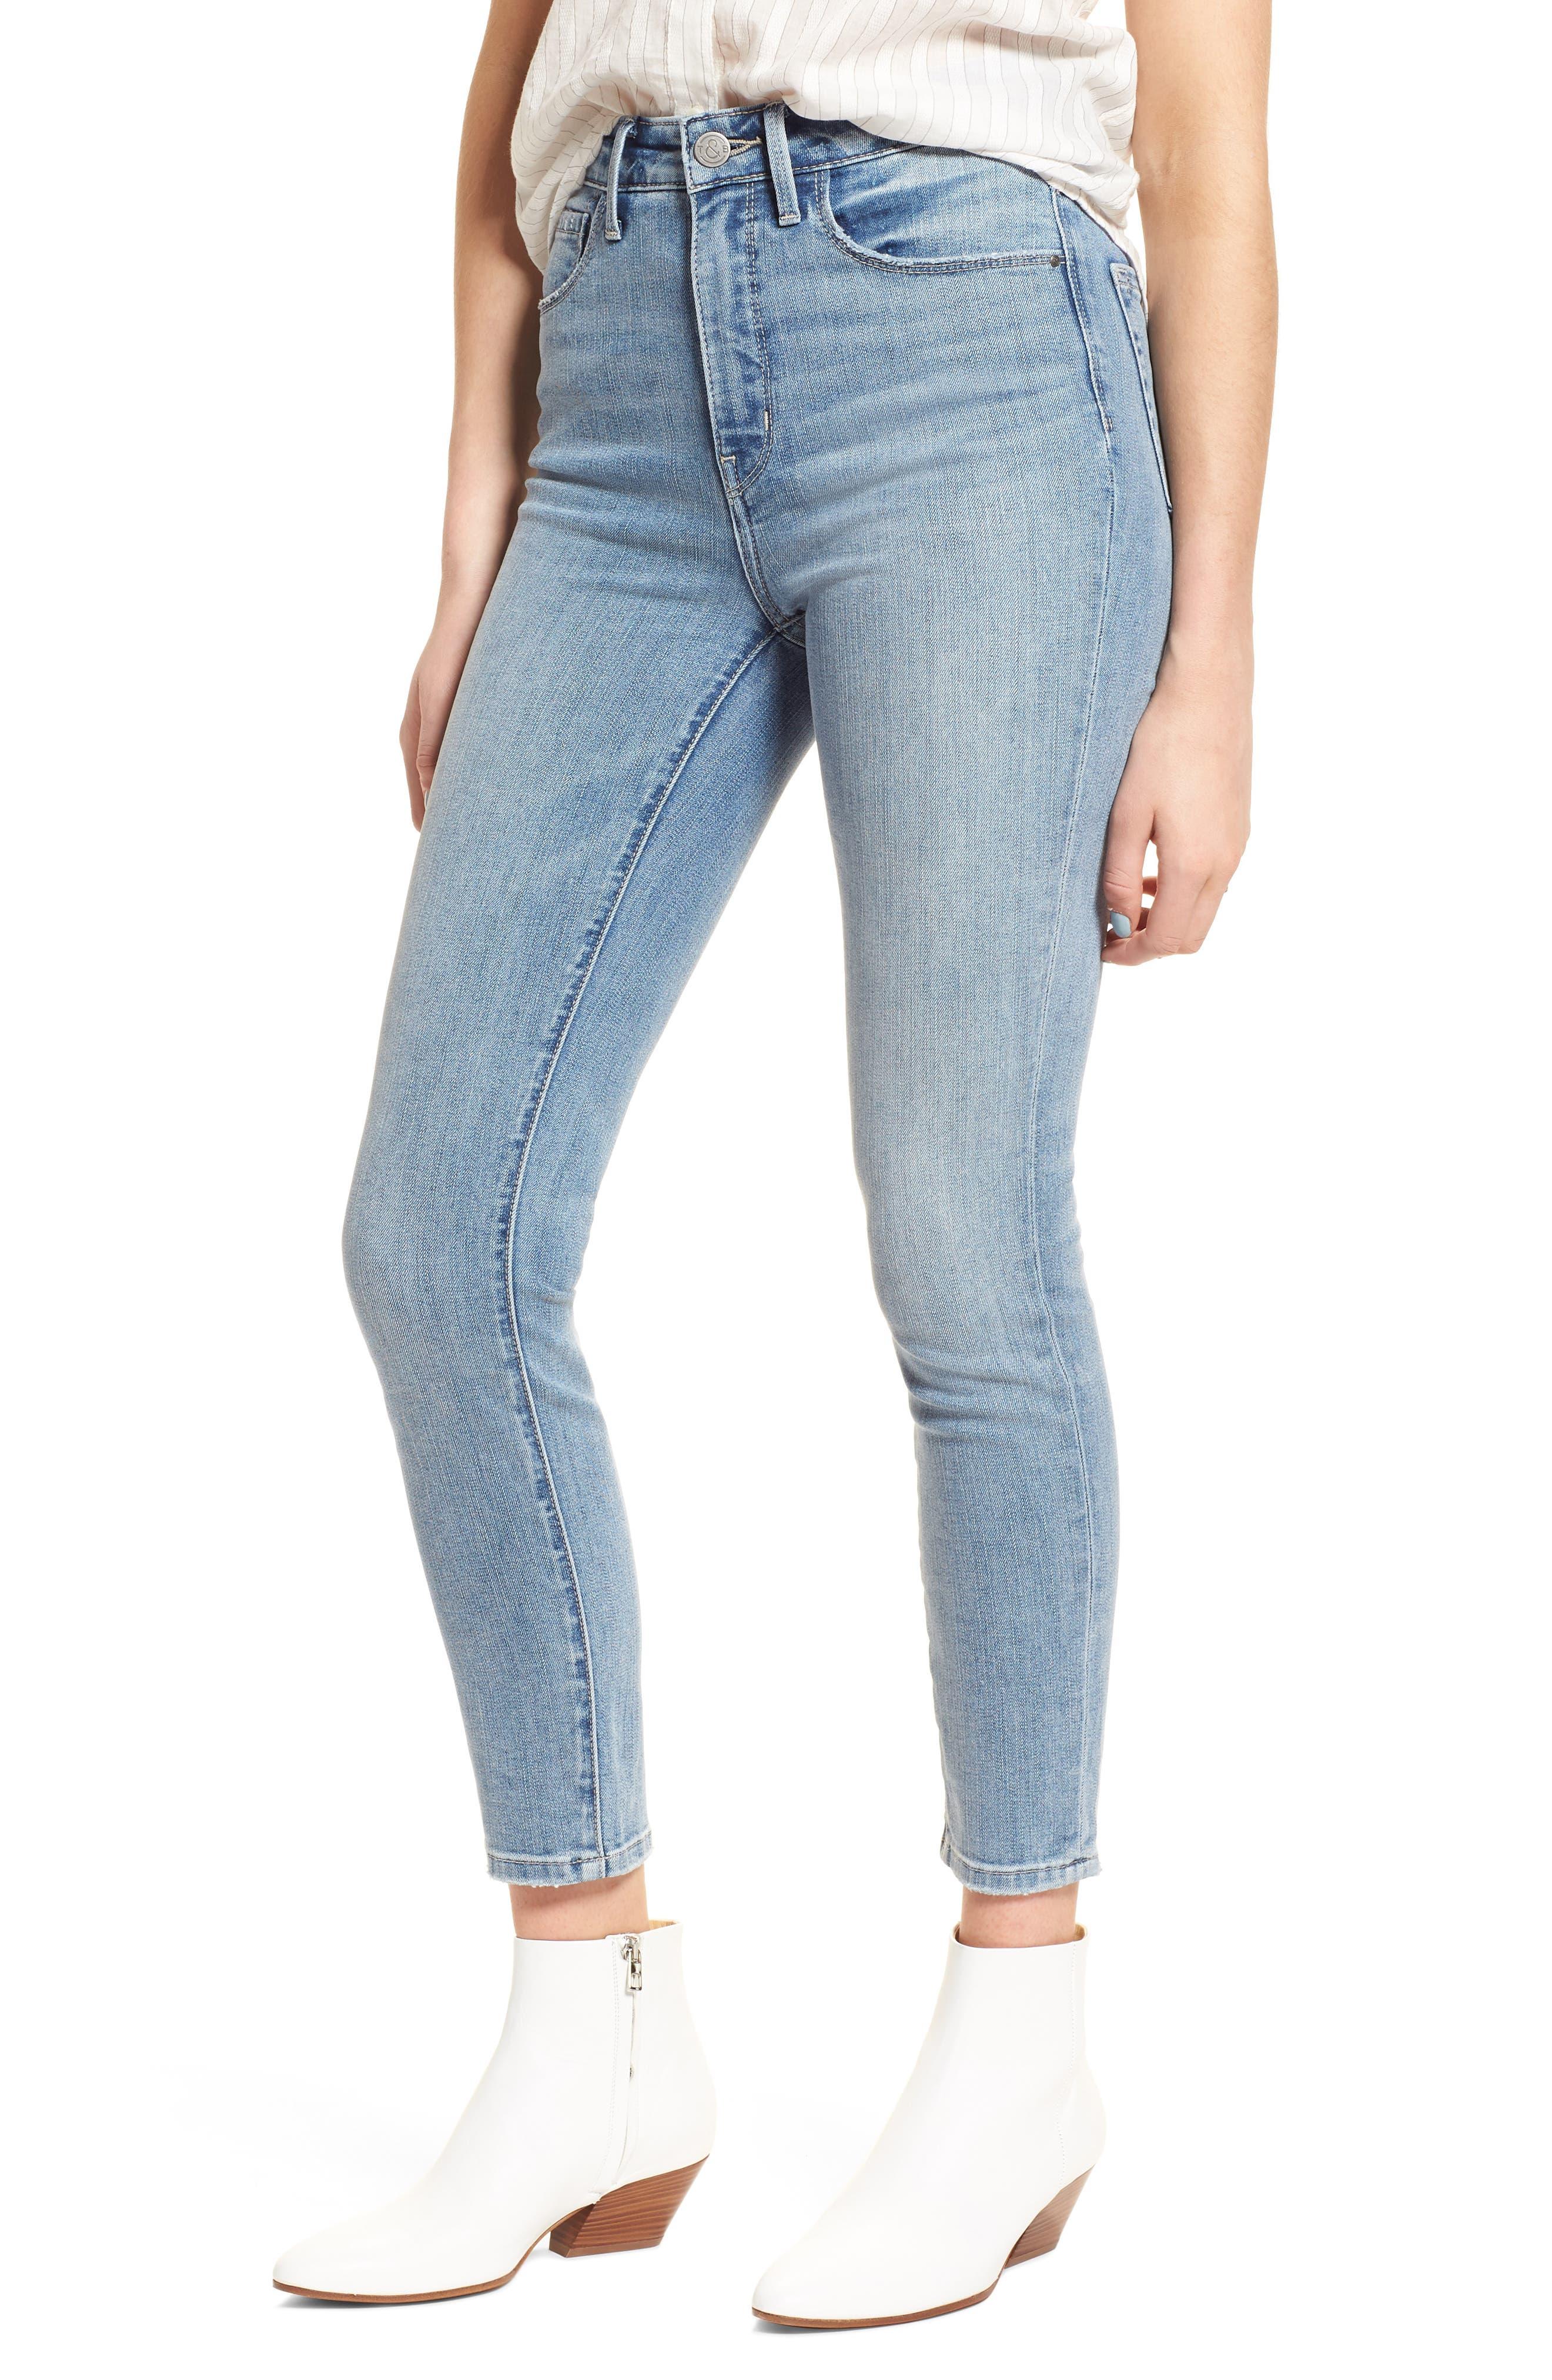 Main Image - Treasure & Bond Charity High Waist Crop Skinny Jeans (Rain Extra Light Worn)